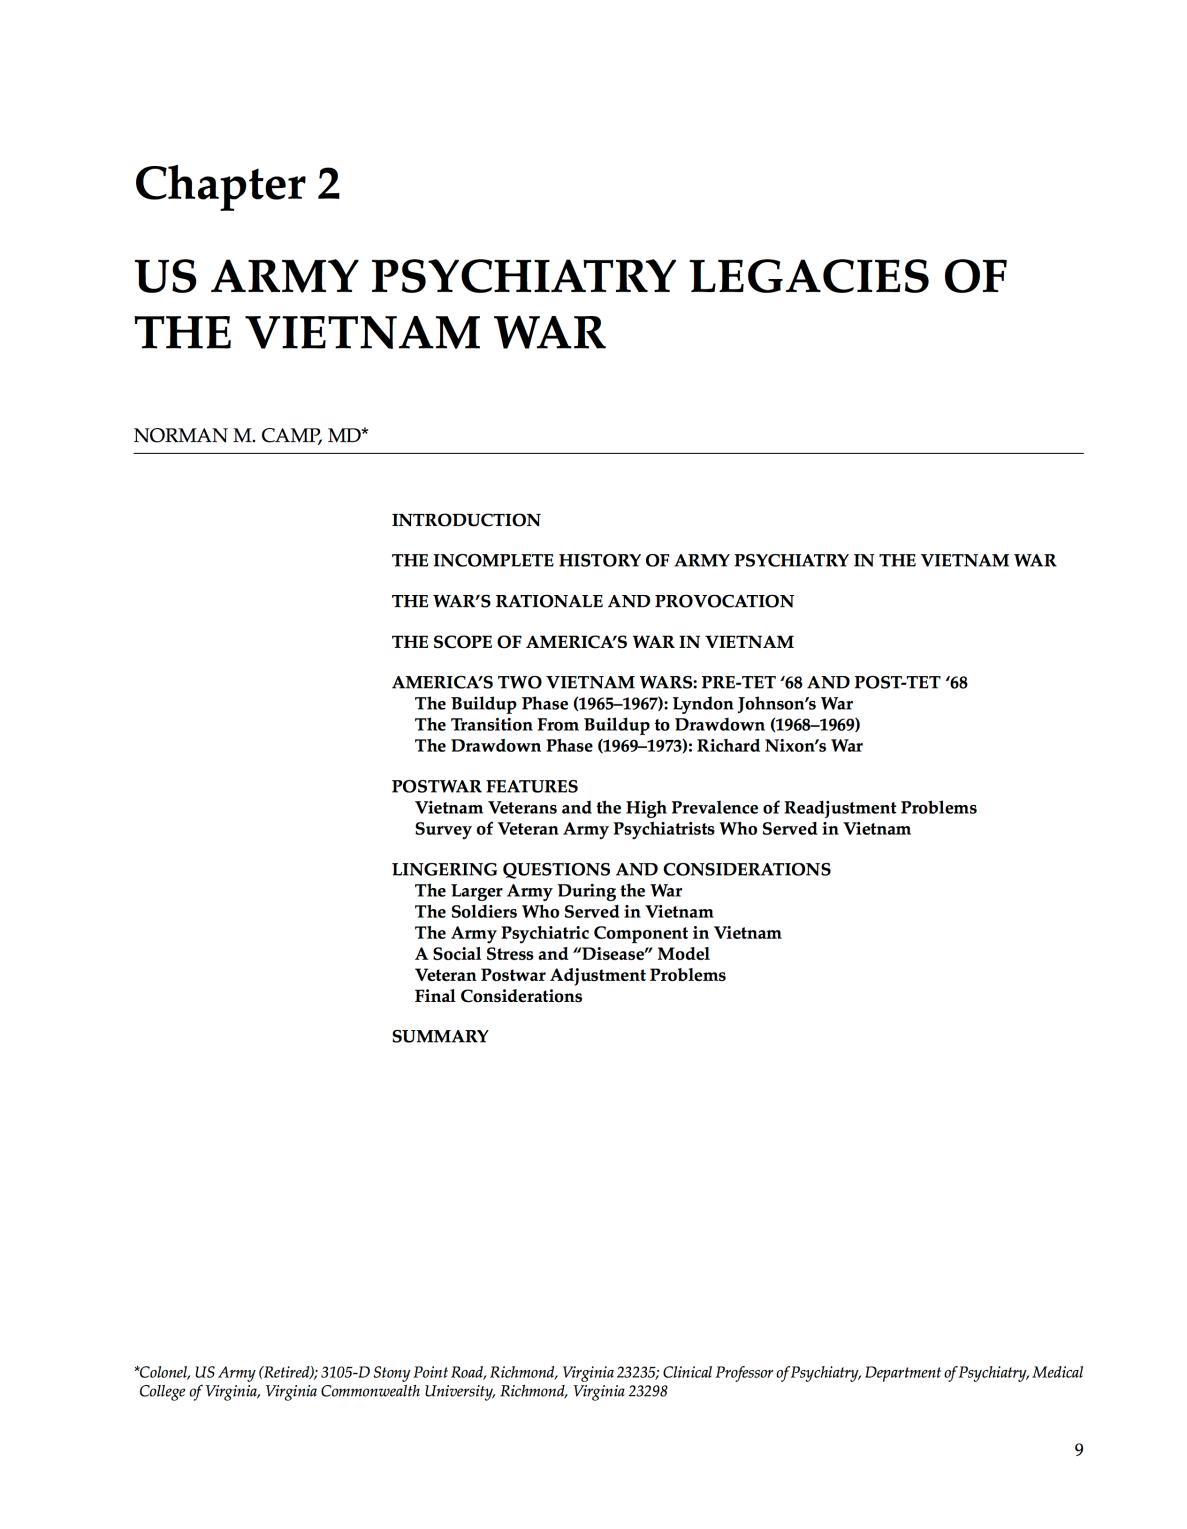 US Army Psychiatry Legacies - Vietnam War